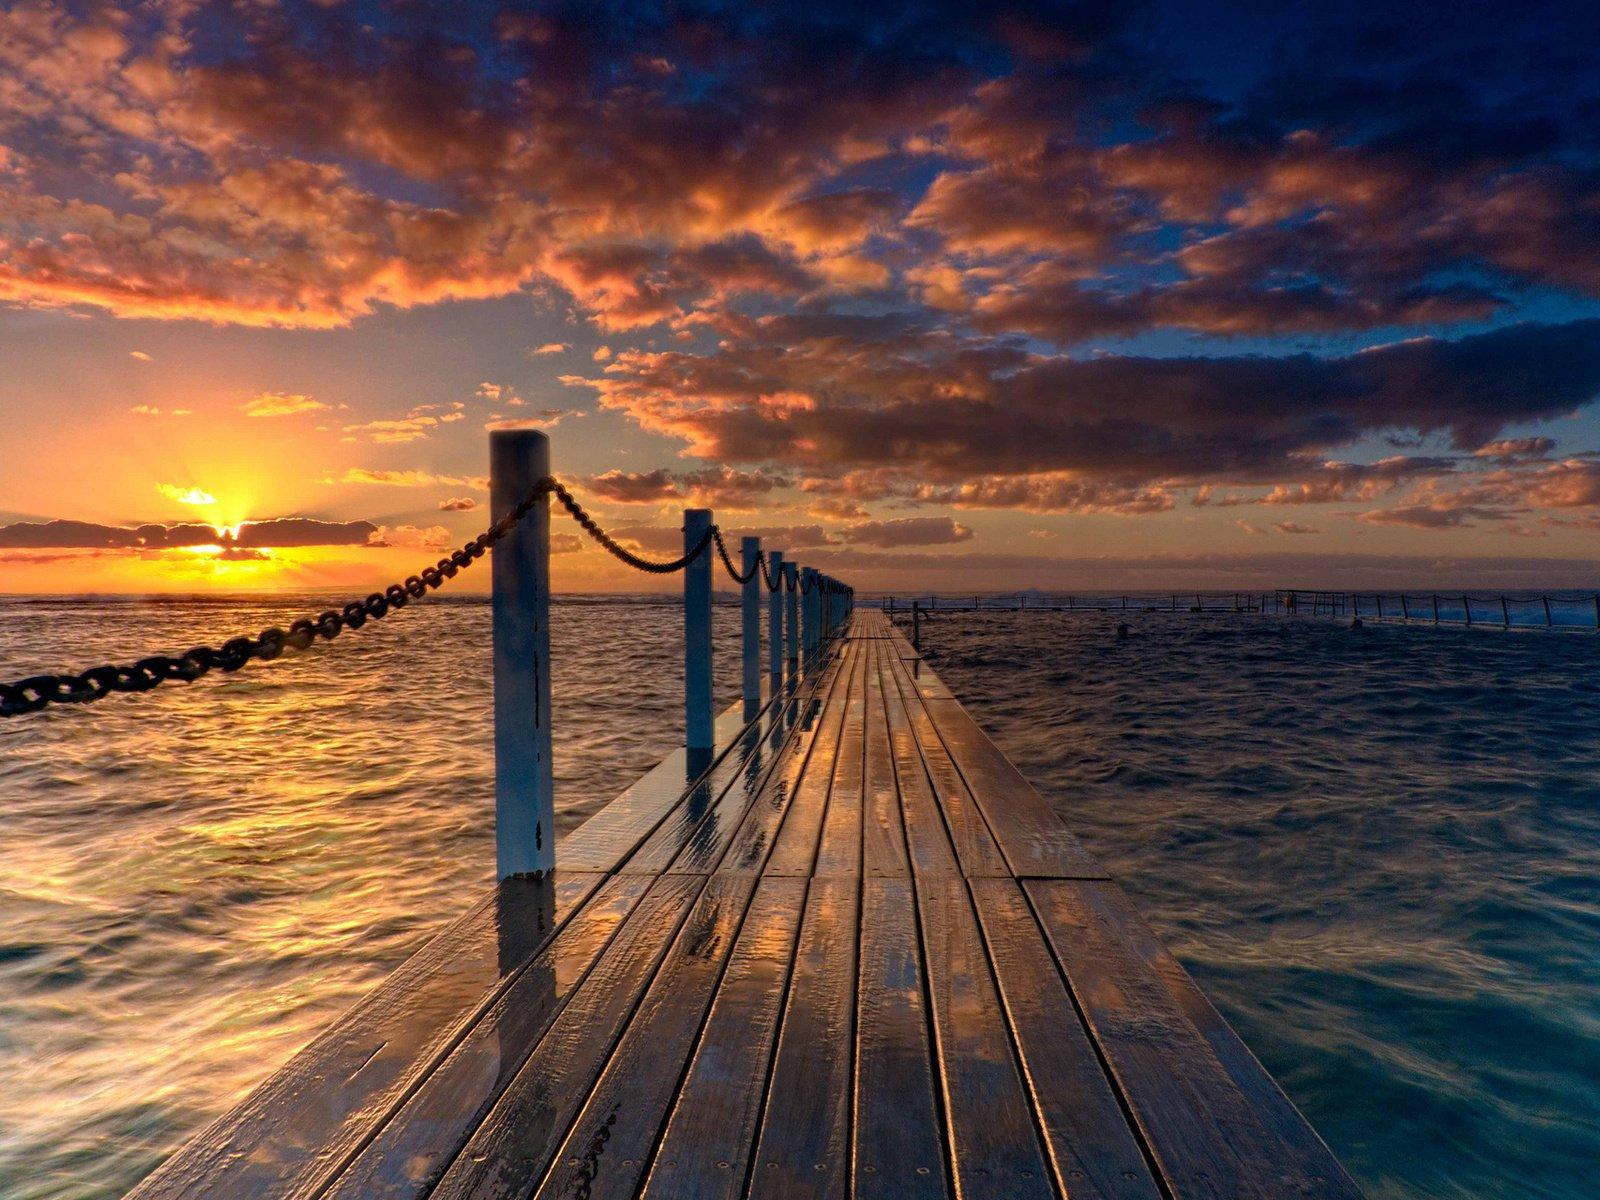 мост закат озеро небо скачать